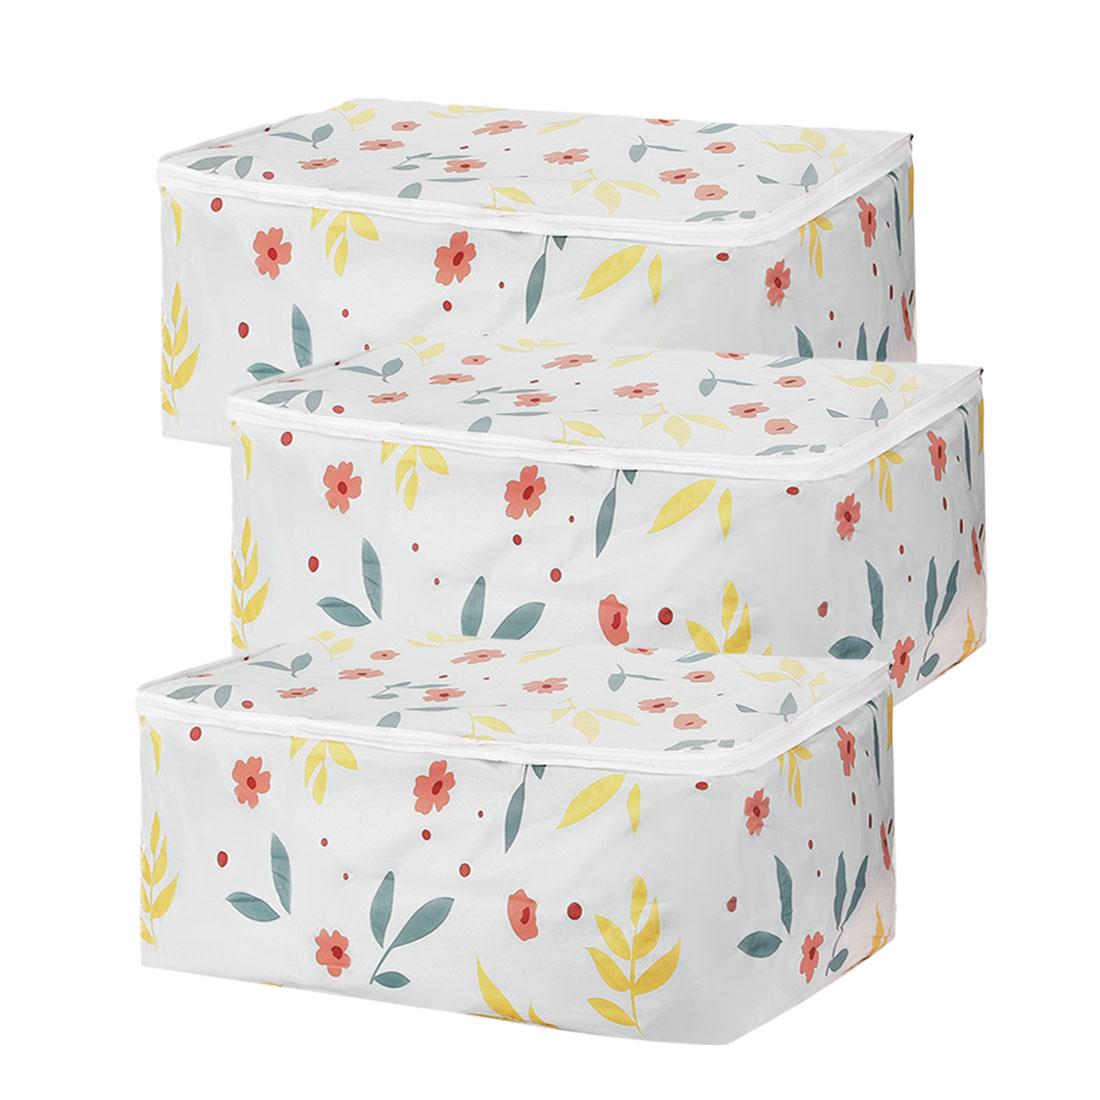 21.7 x 14.2 x 9.1 Inch Quilt Storage Bag Cloths Container for Closet 3pcs